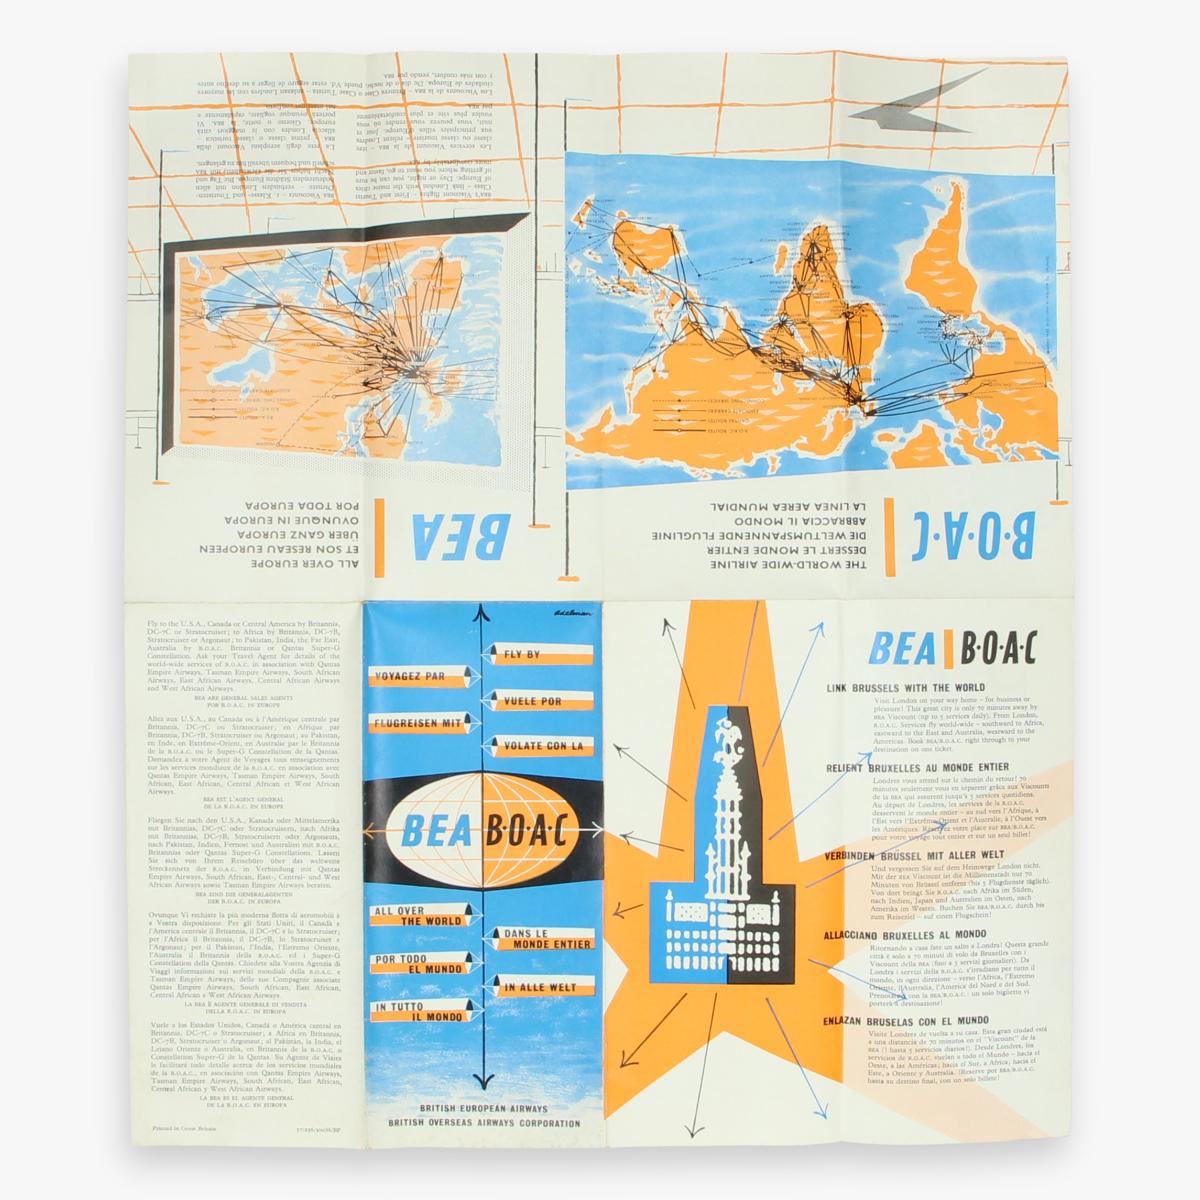 Afbeeldingen van fleyer British european airways - british overseas airways corporation